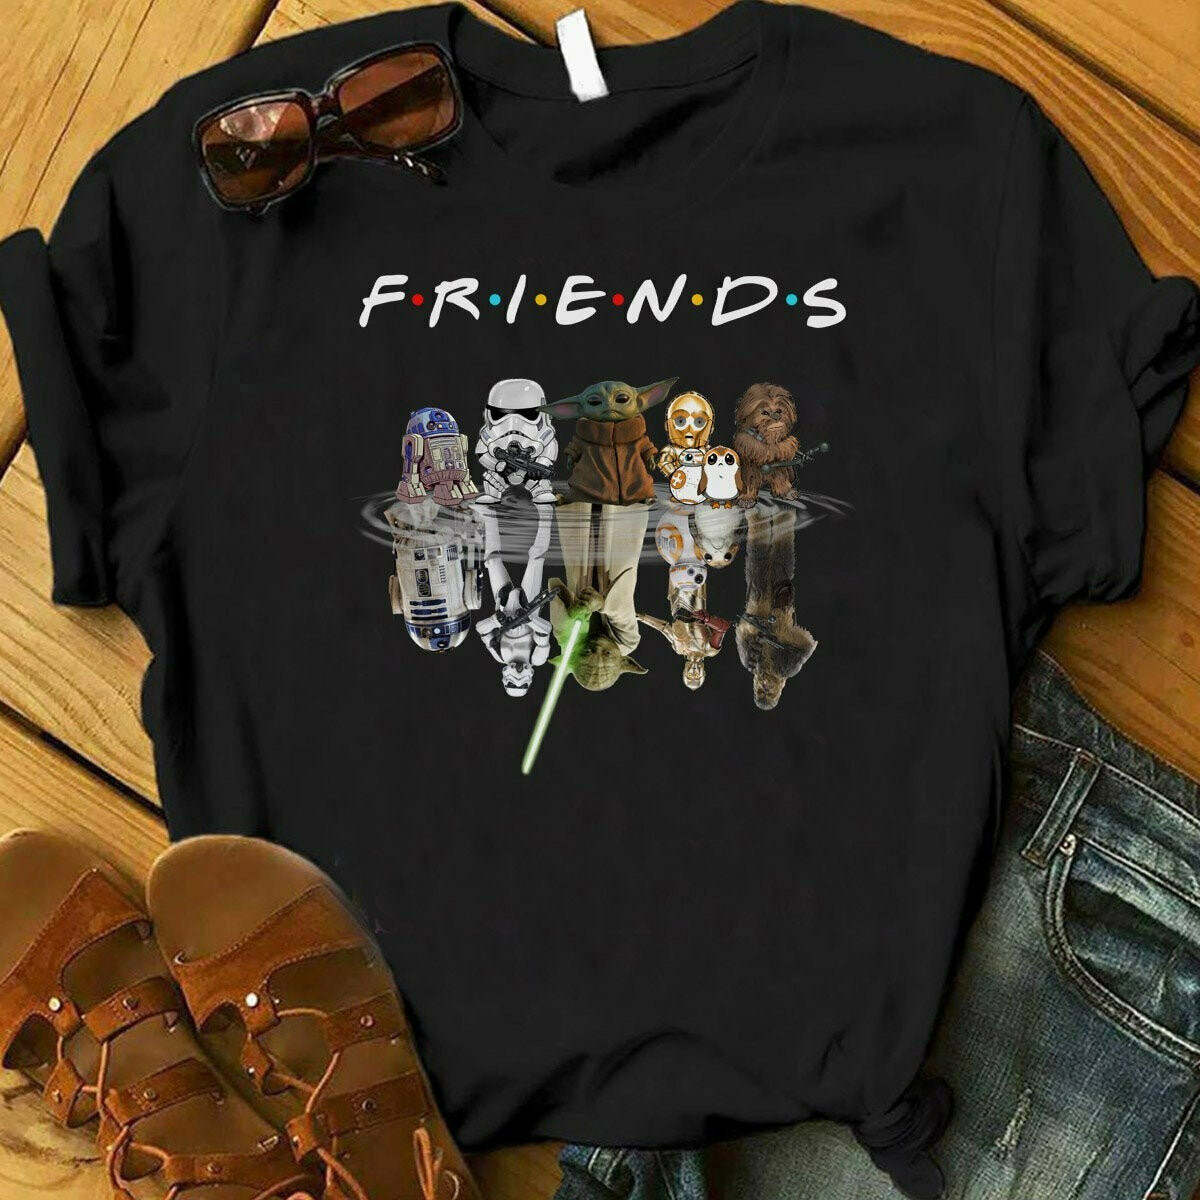 Star Wars And Friend Shirt, Cute Star Wars Sweatshirt, Baby Yoda Hoodie, Storm Trooper, Darth Vader, Baby Yoda, Star Wars, Friend TV show, Disney shirt, epcot group shirt, cute family shirt